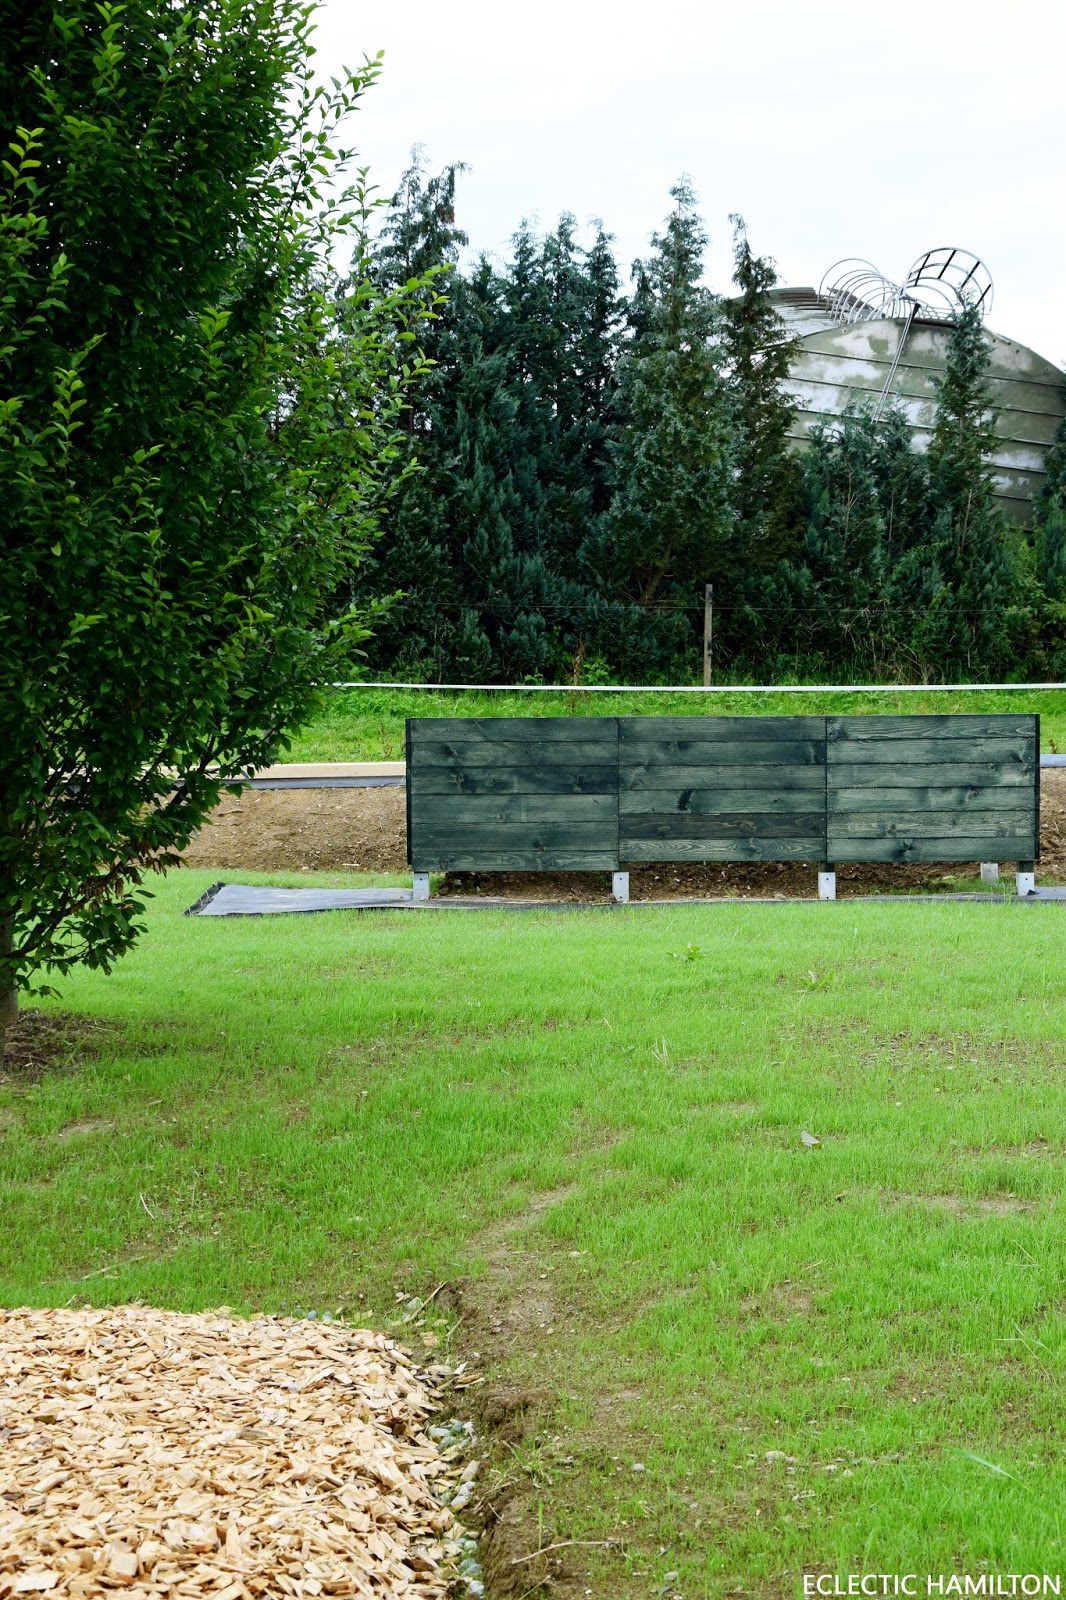 Hochbeet DIY Garten Gemüsebeet selber bauen machen basteln Holz Do it yourself Beet